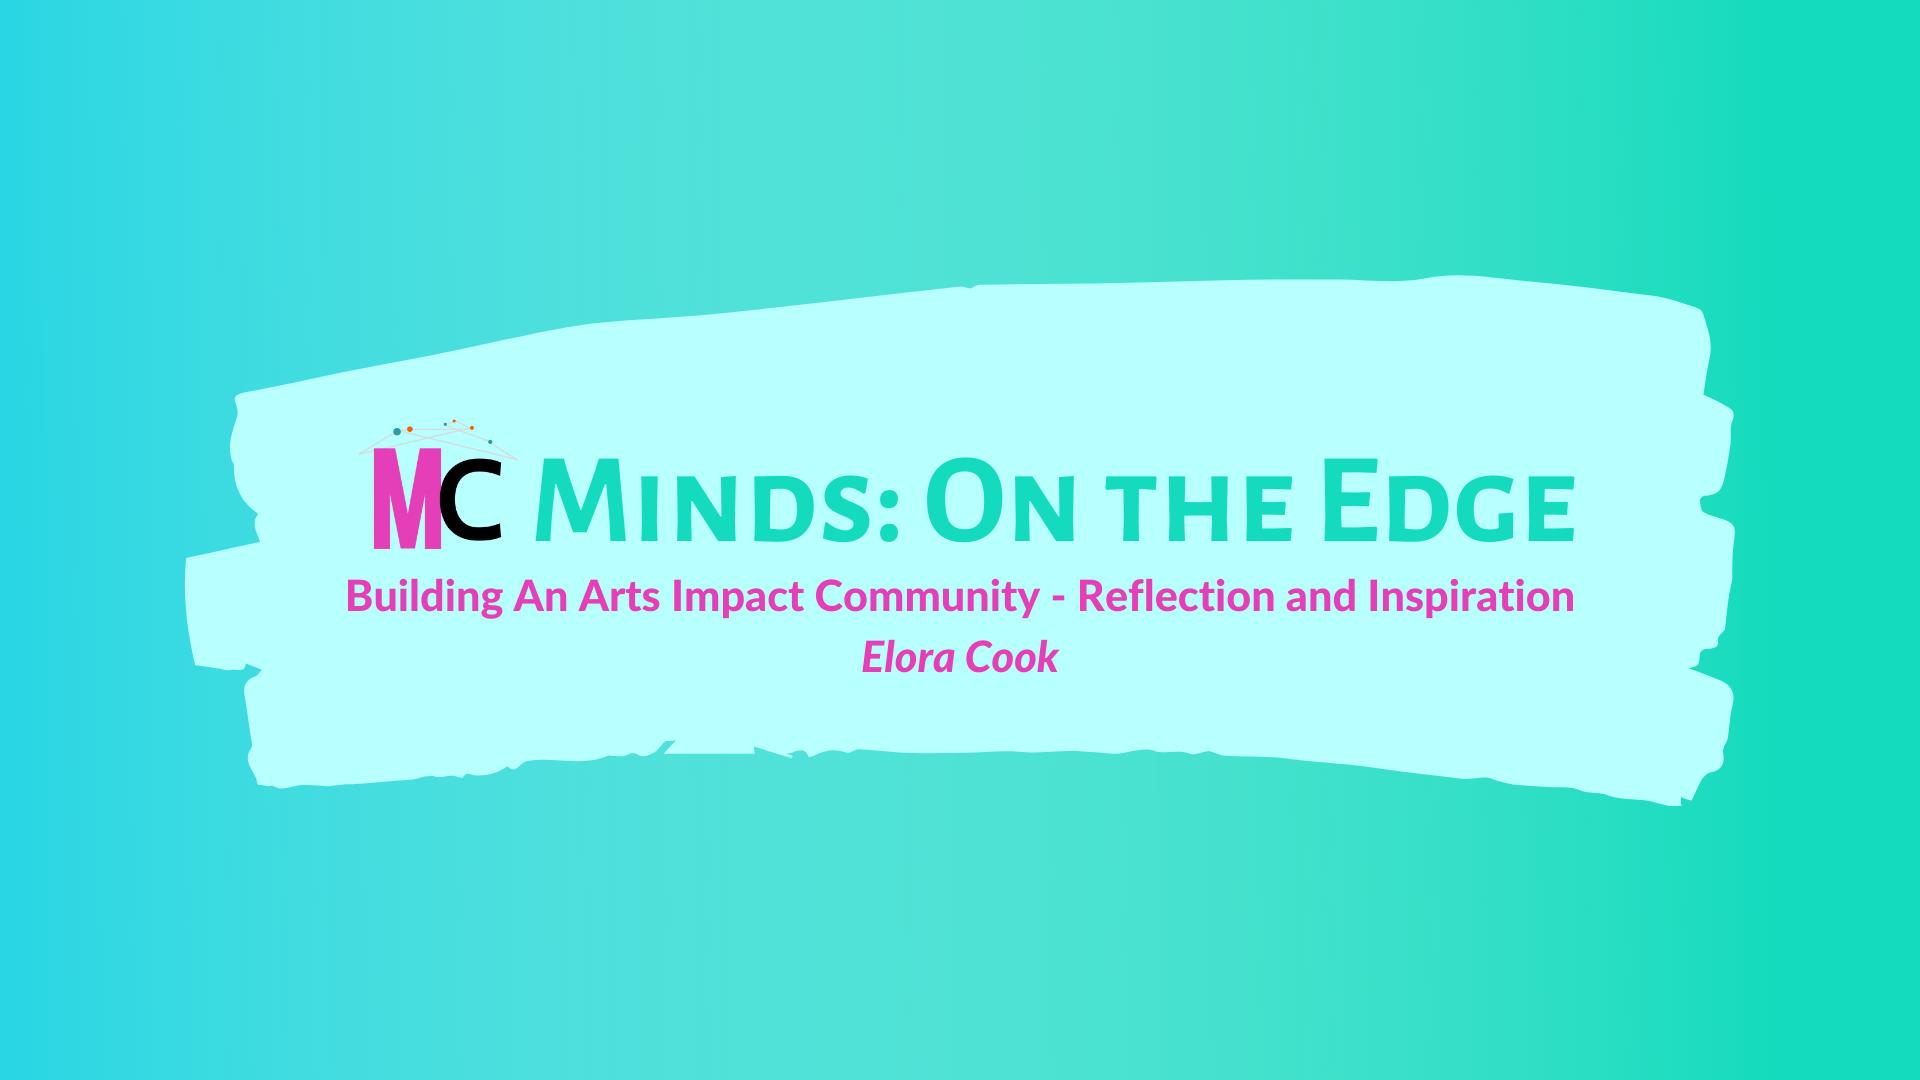 MC MINDS ON THE EDGE blog